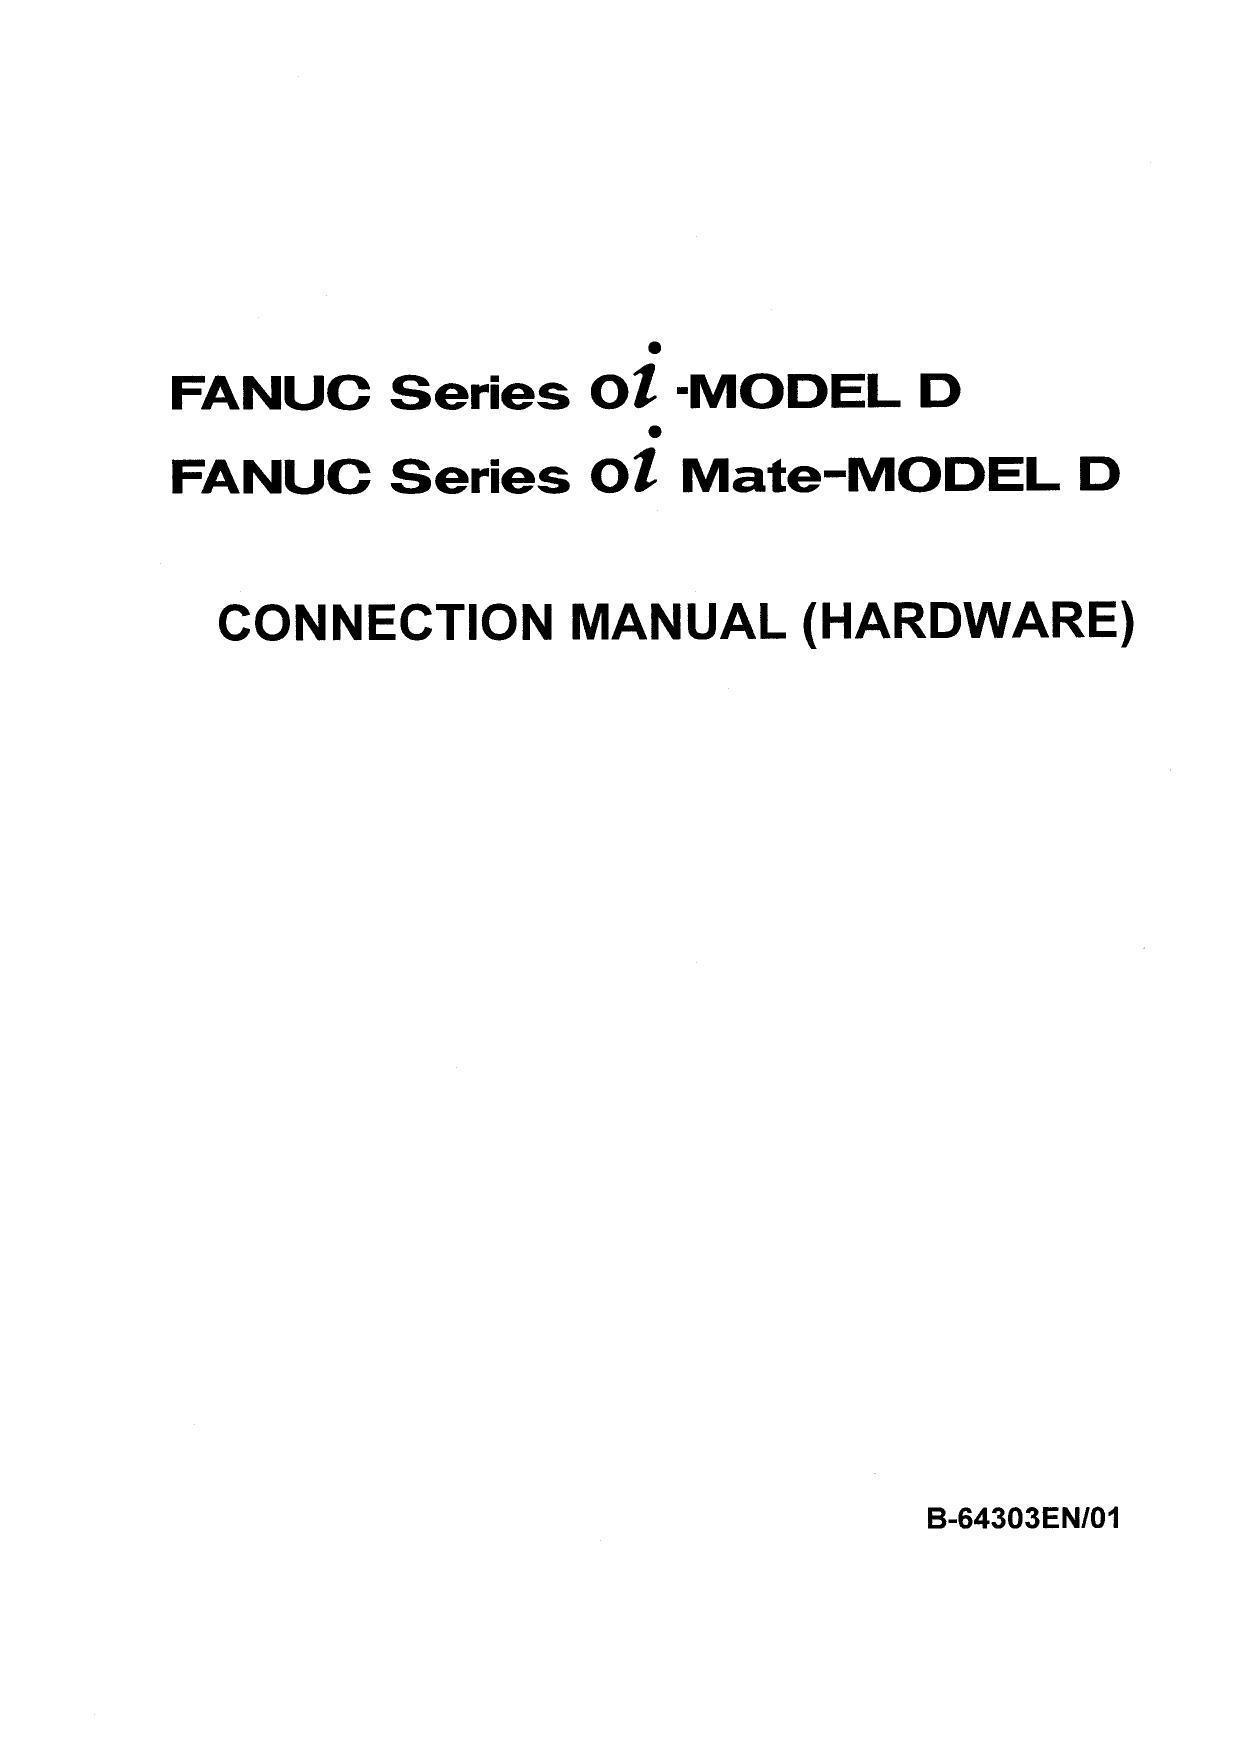 CONNECTION MANUAL (HARDWARE) | manualzz com